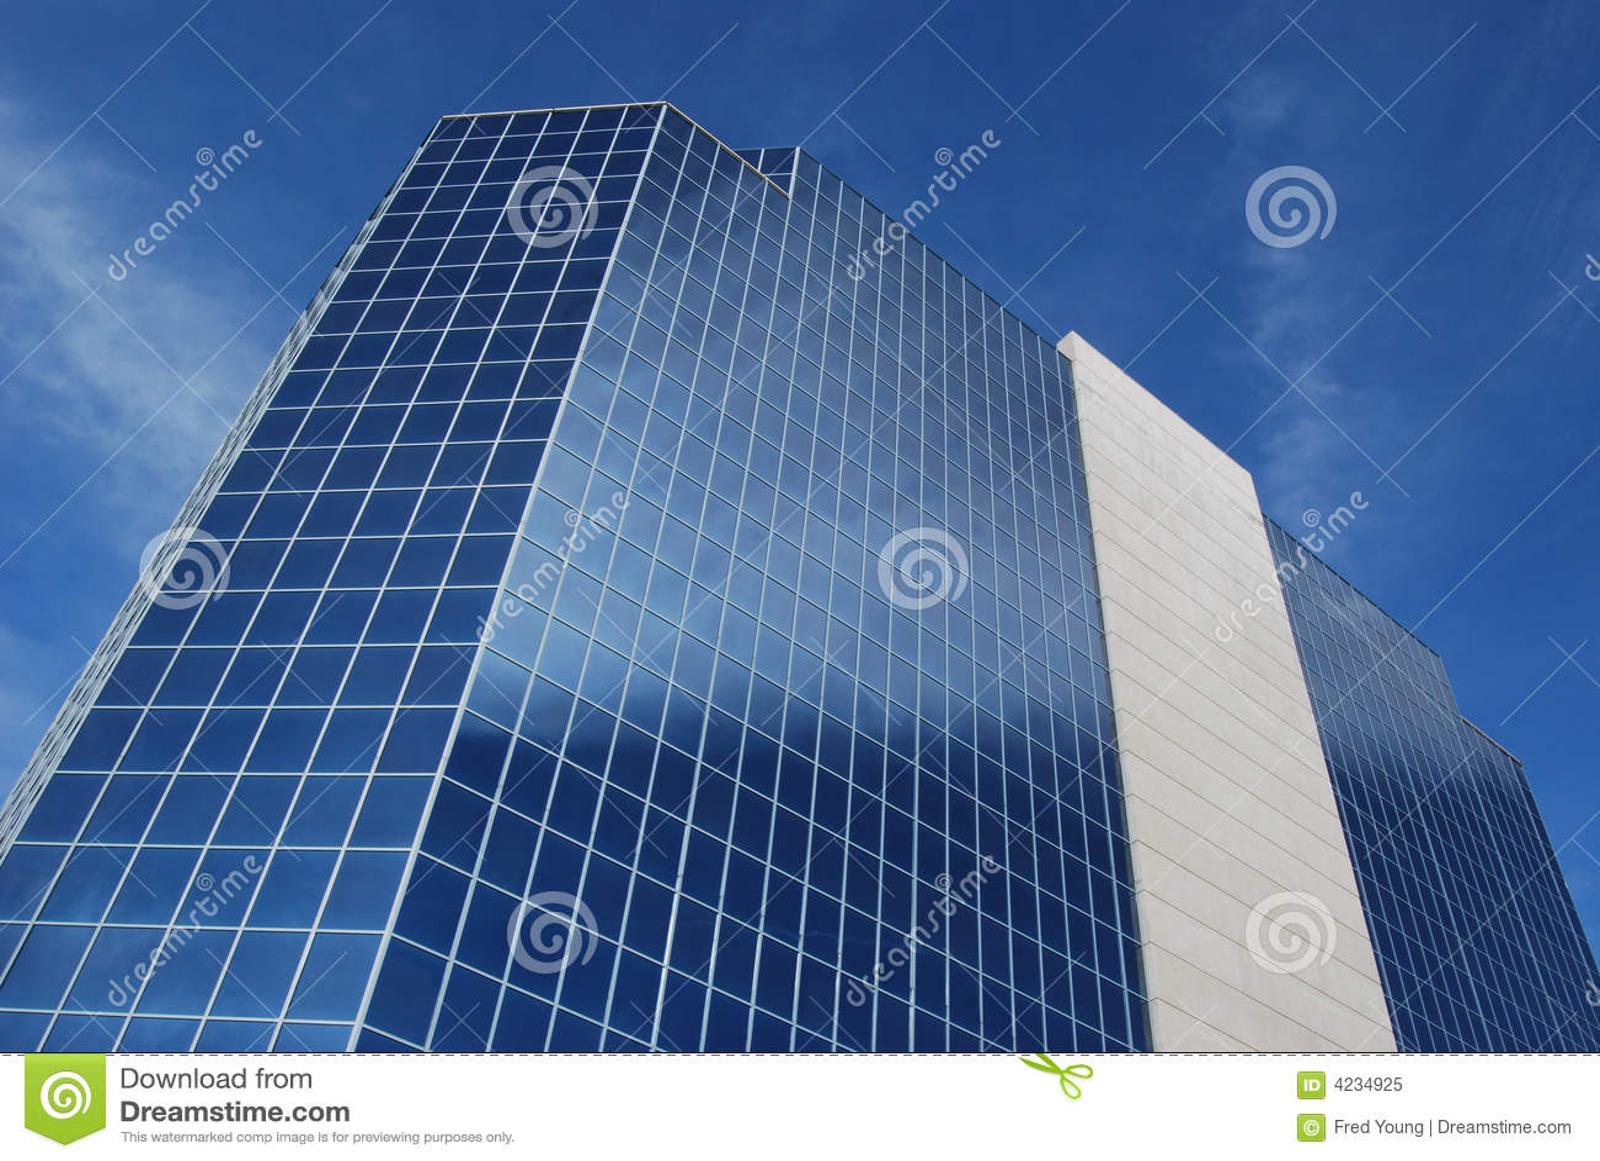 Bureau moderne angle verre et métal chiffonnier tiroirs a